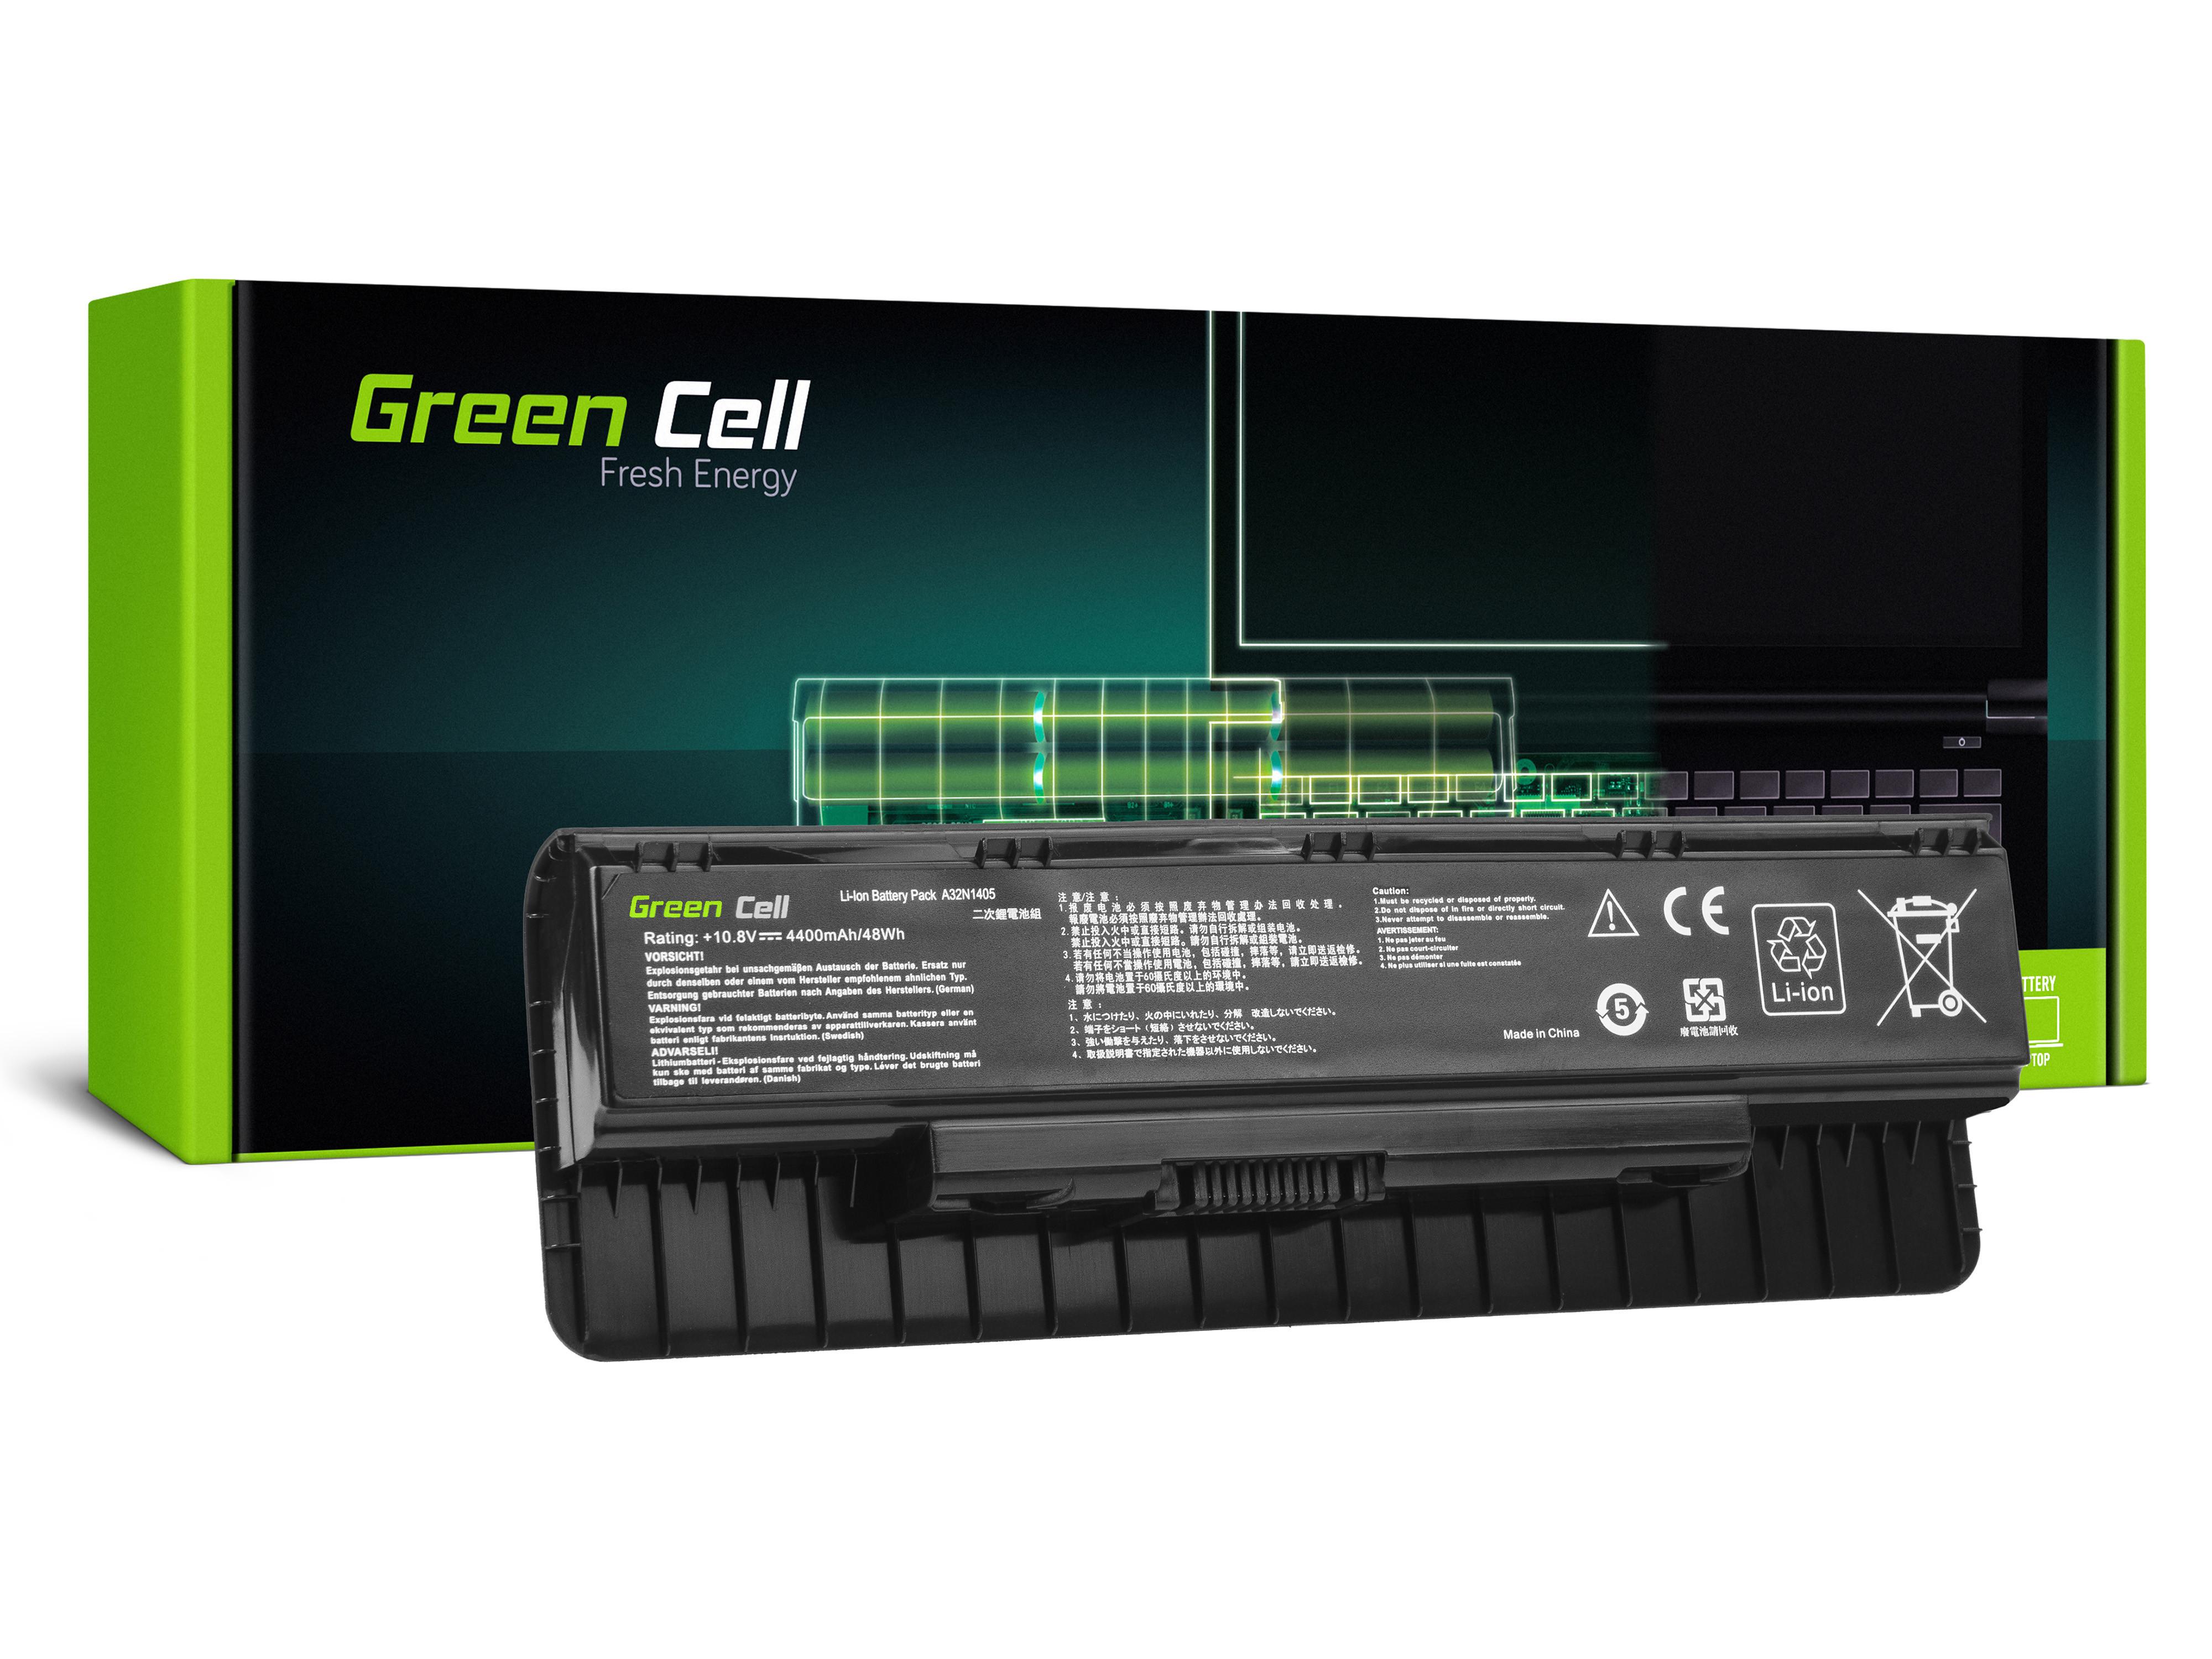 Green Cell AS129 Baterie Asus A32N1405 Asus G551 G551J G551JM G551JW G771 G771J G771JM G771JW N551 4400mAh Li-ion - neoriginální